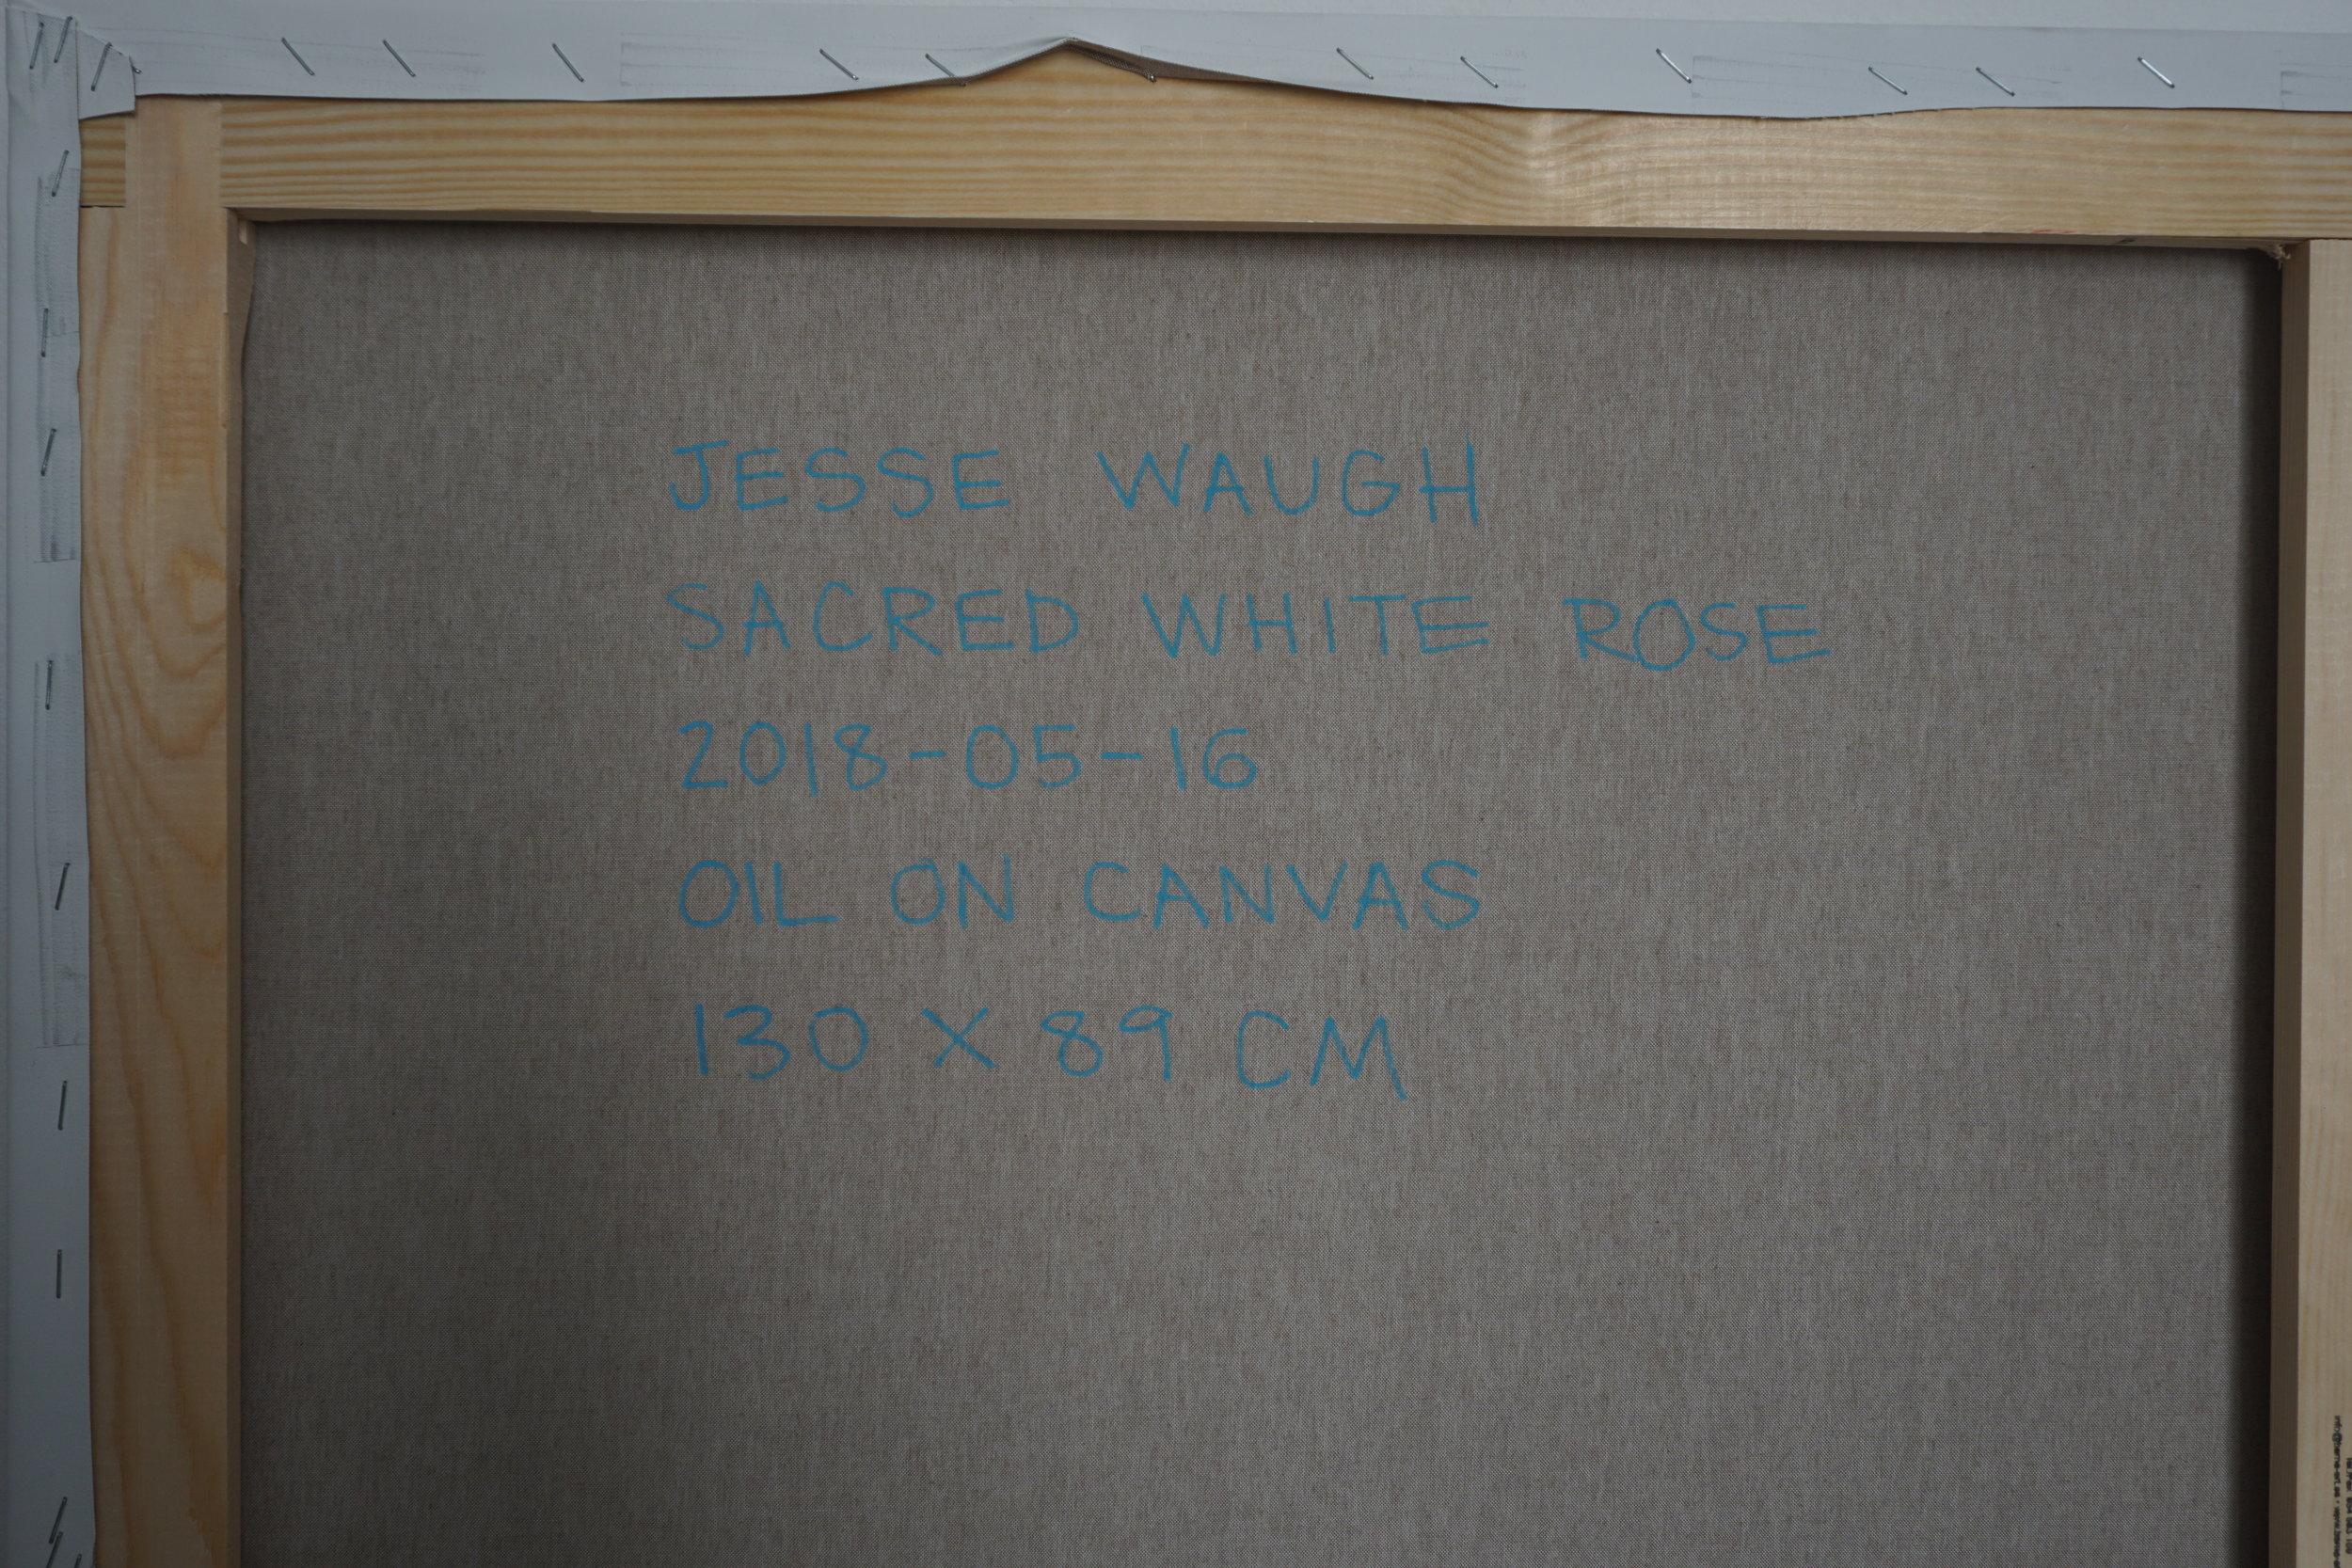 DSC01434.JPG